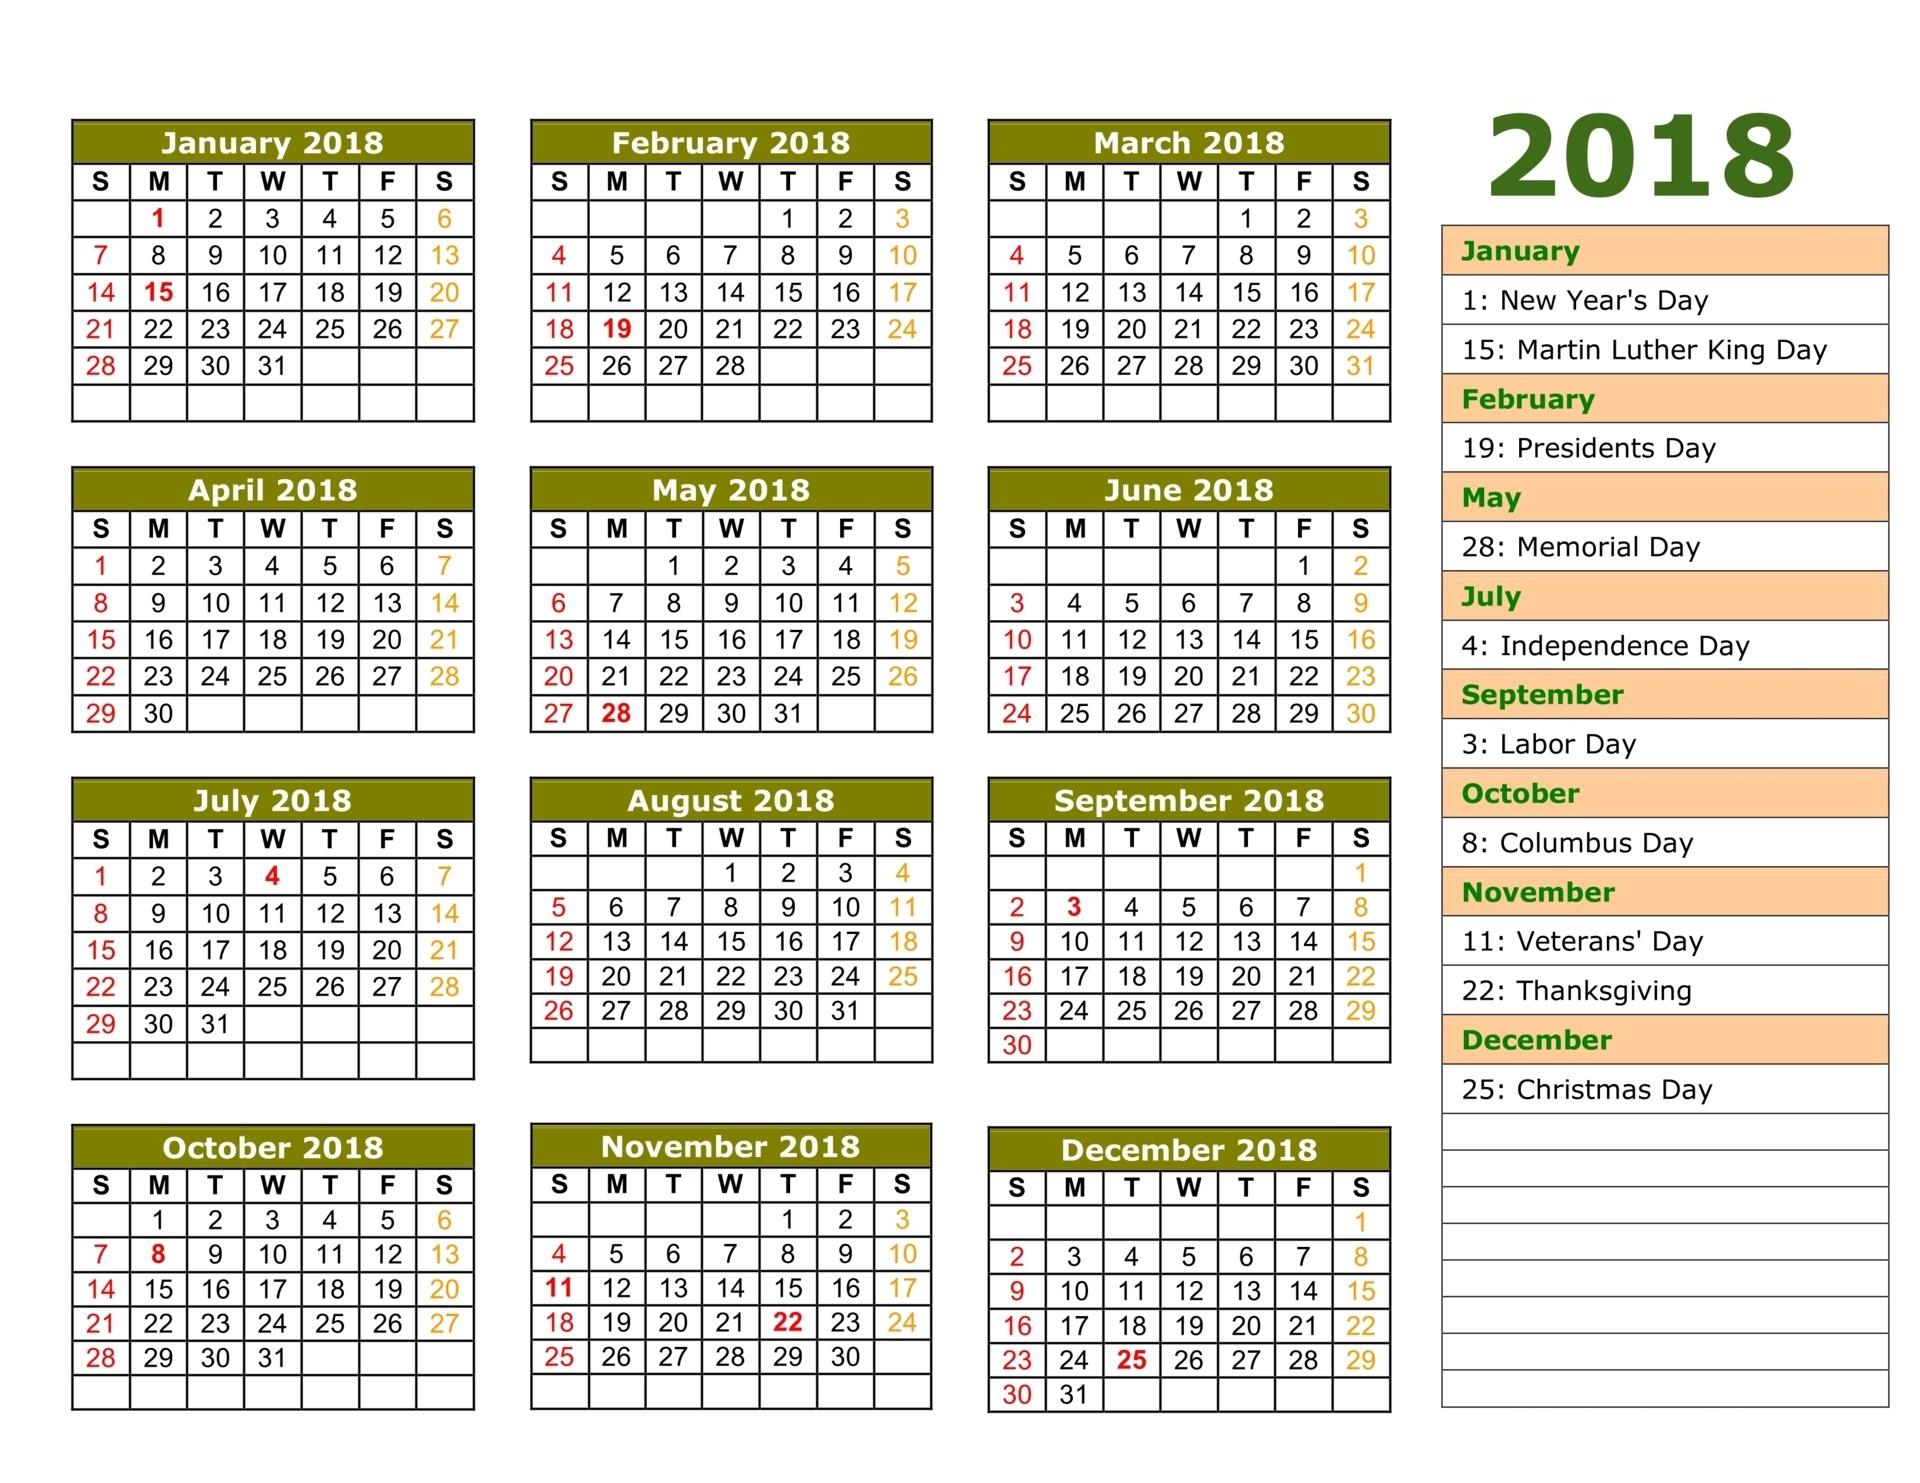 Islamic Calendar 2018 | Hijri Calendar 1439 | Urdu Calendar 2018